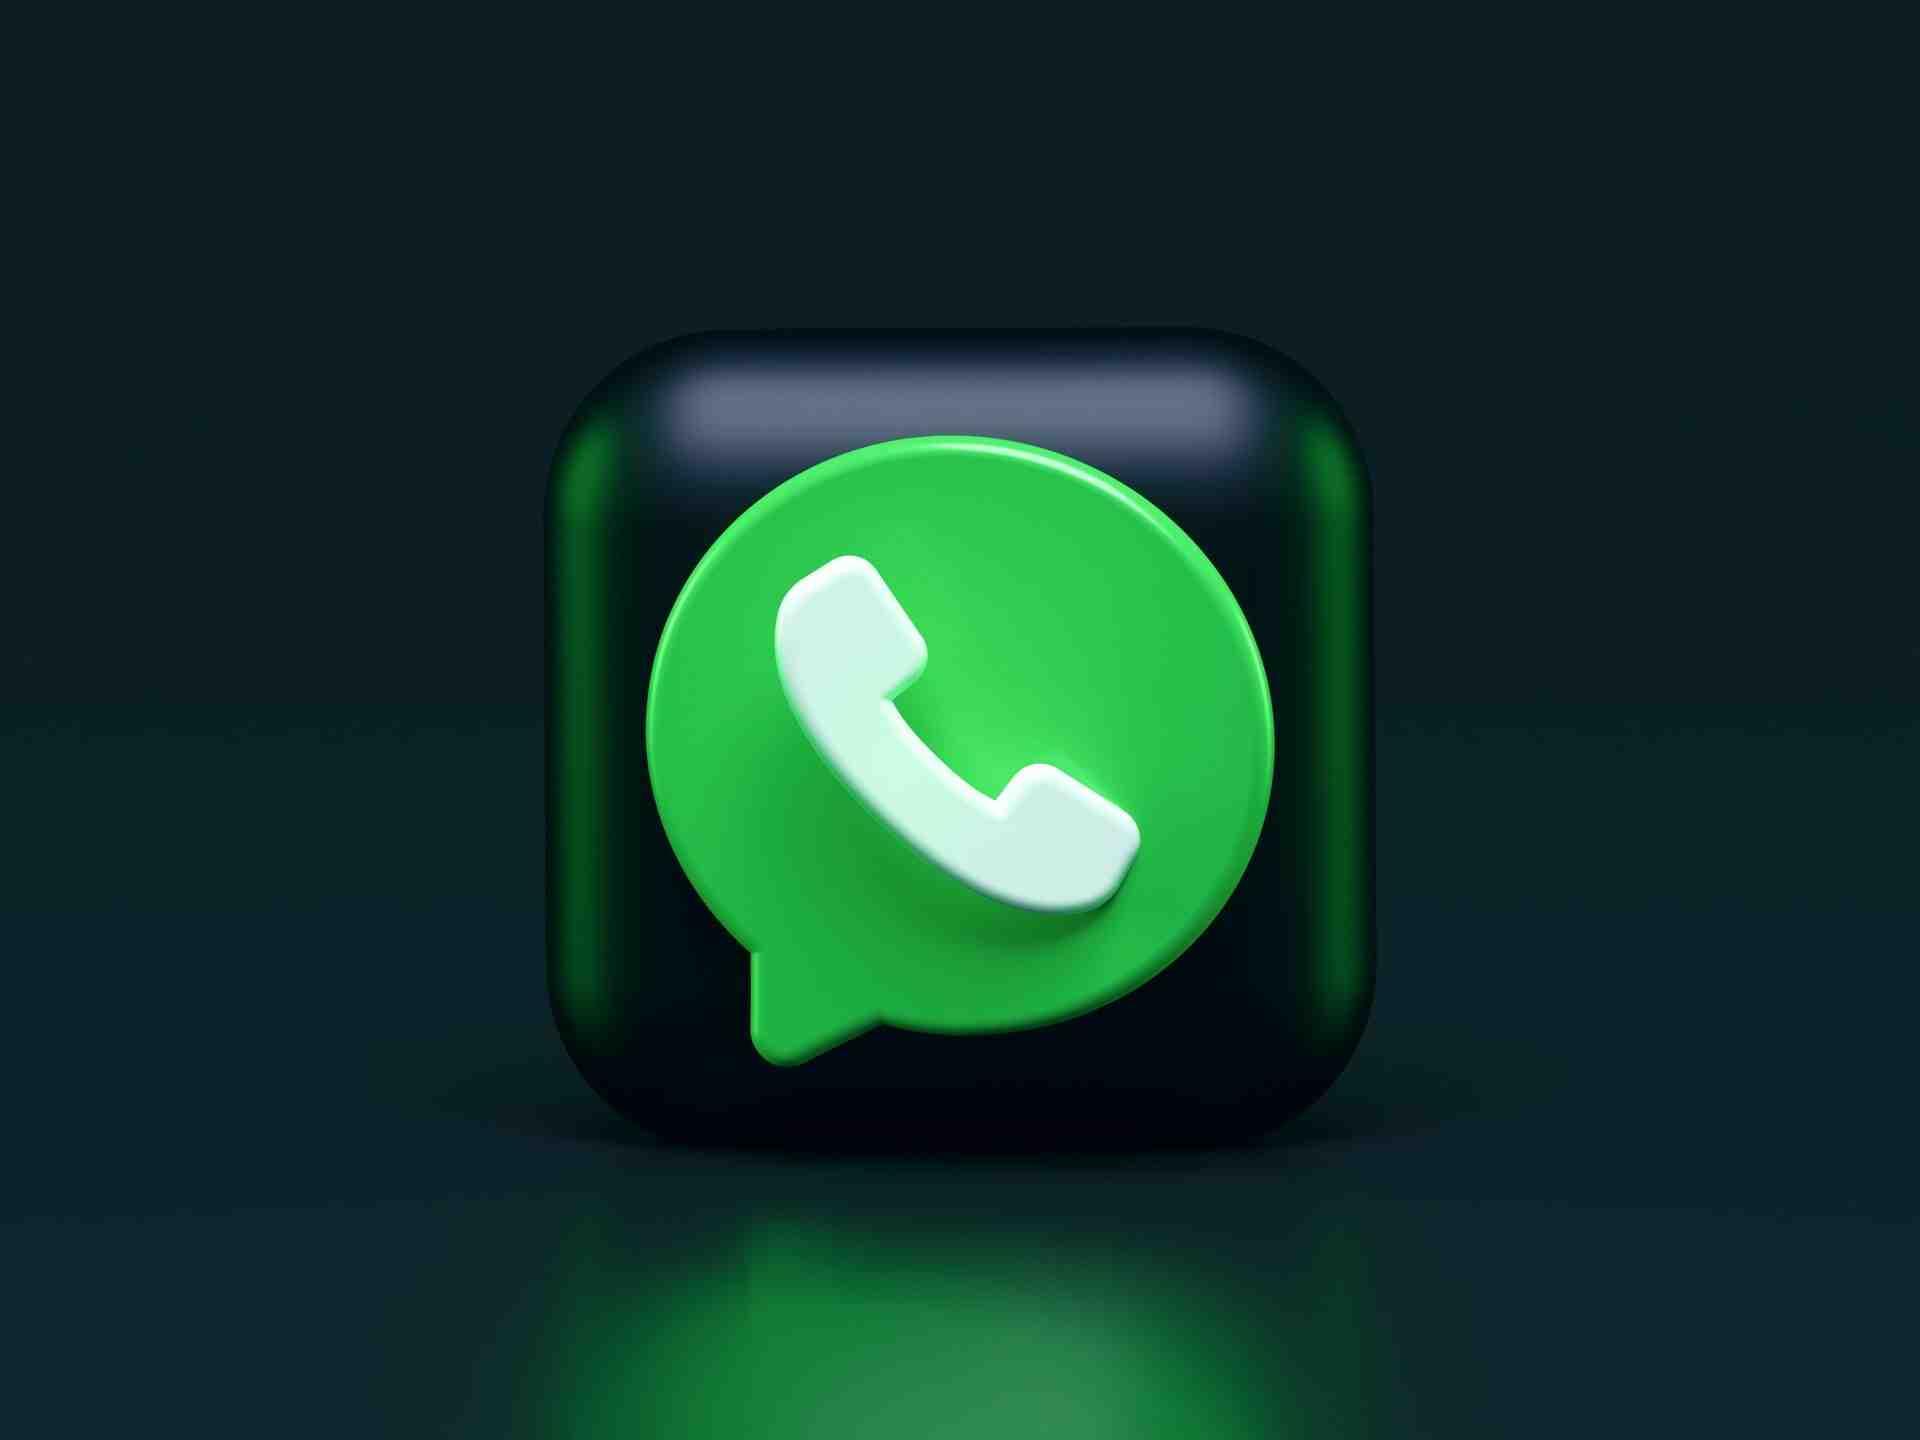 Pourquoi le logo WhatsApp ?